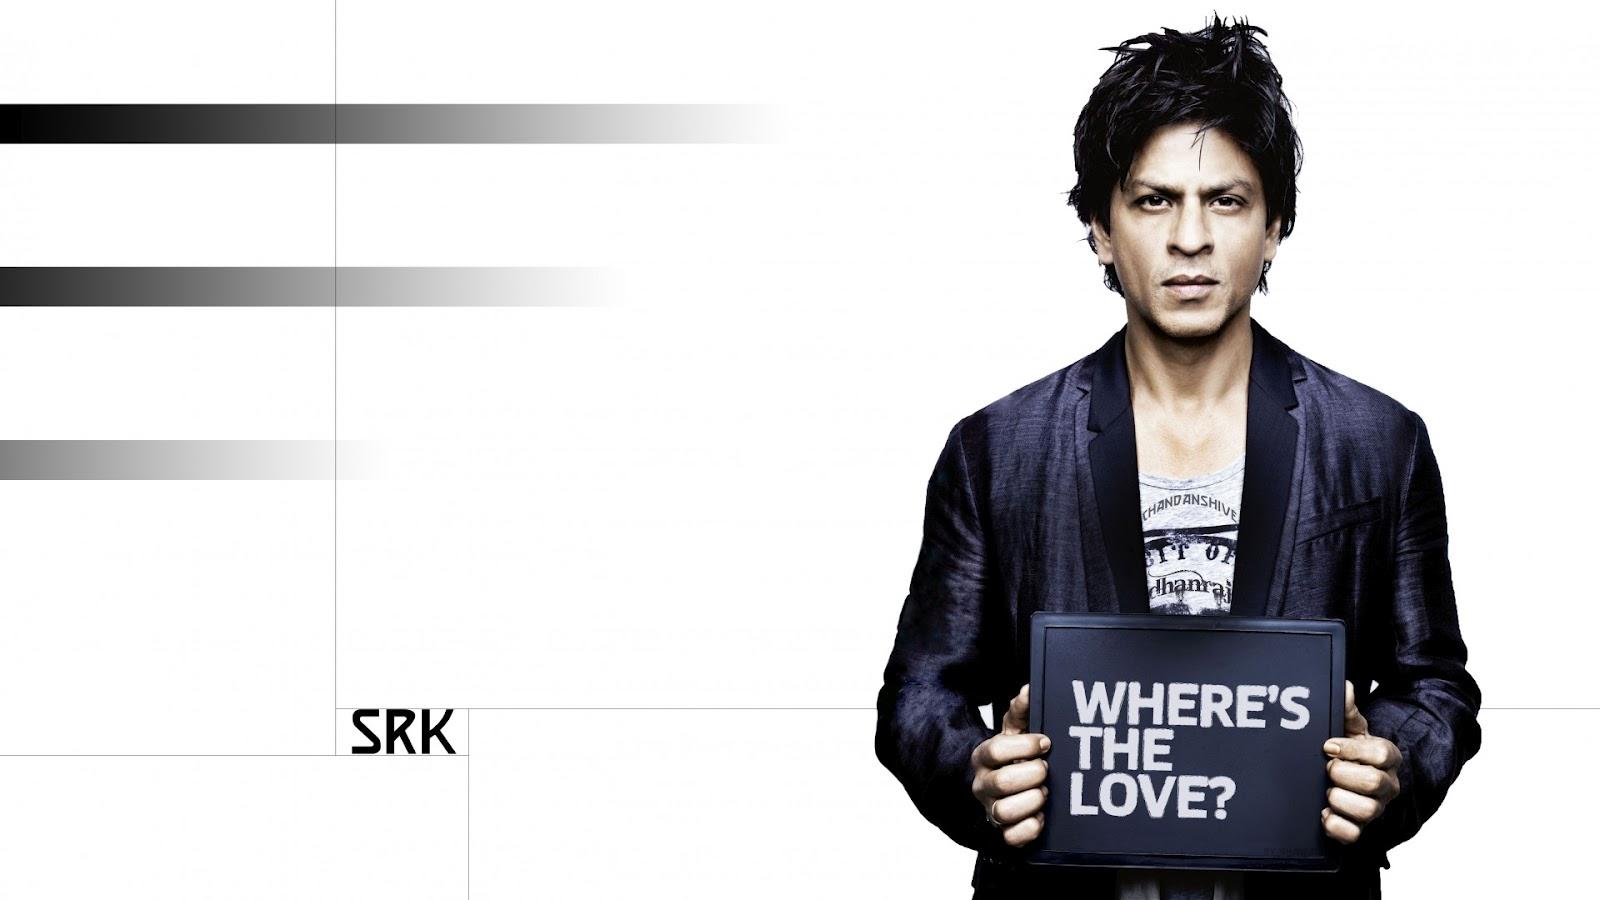 Shahrukh Khan Hd Wallpapers: Celebrity Model Wallpaper: Shahrukh Khan HD Wallpapers 1080p